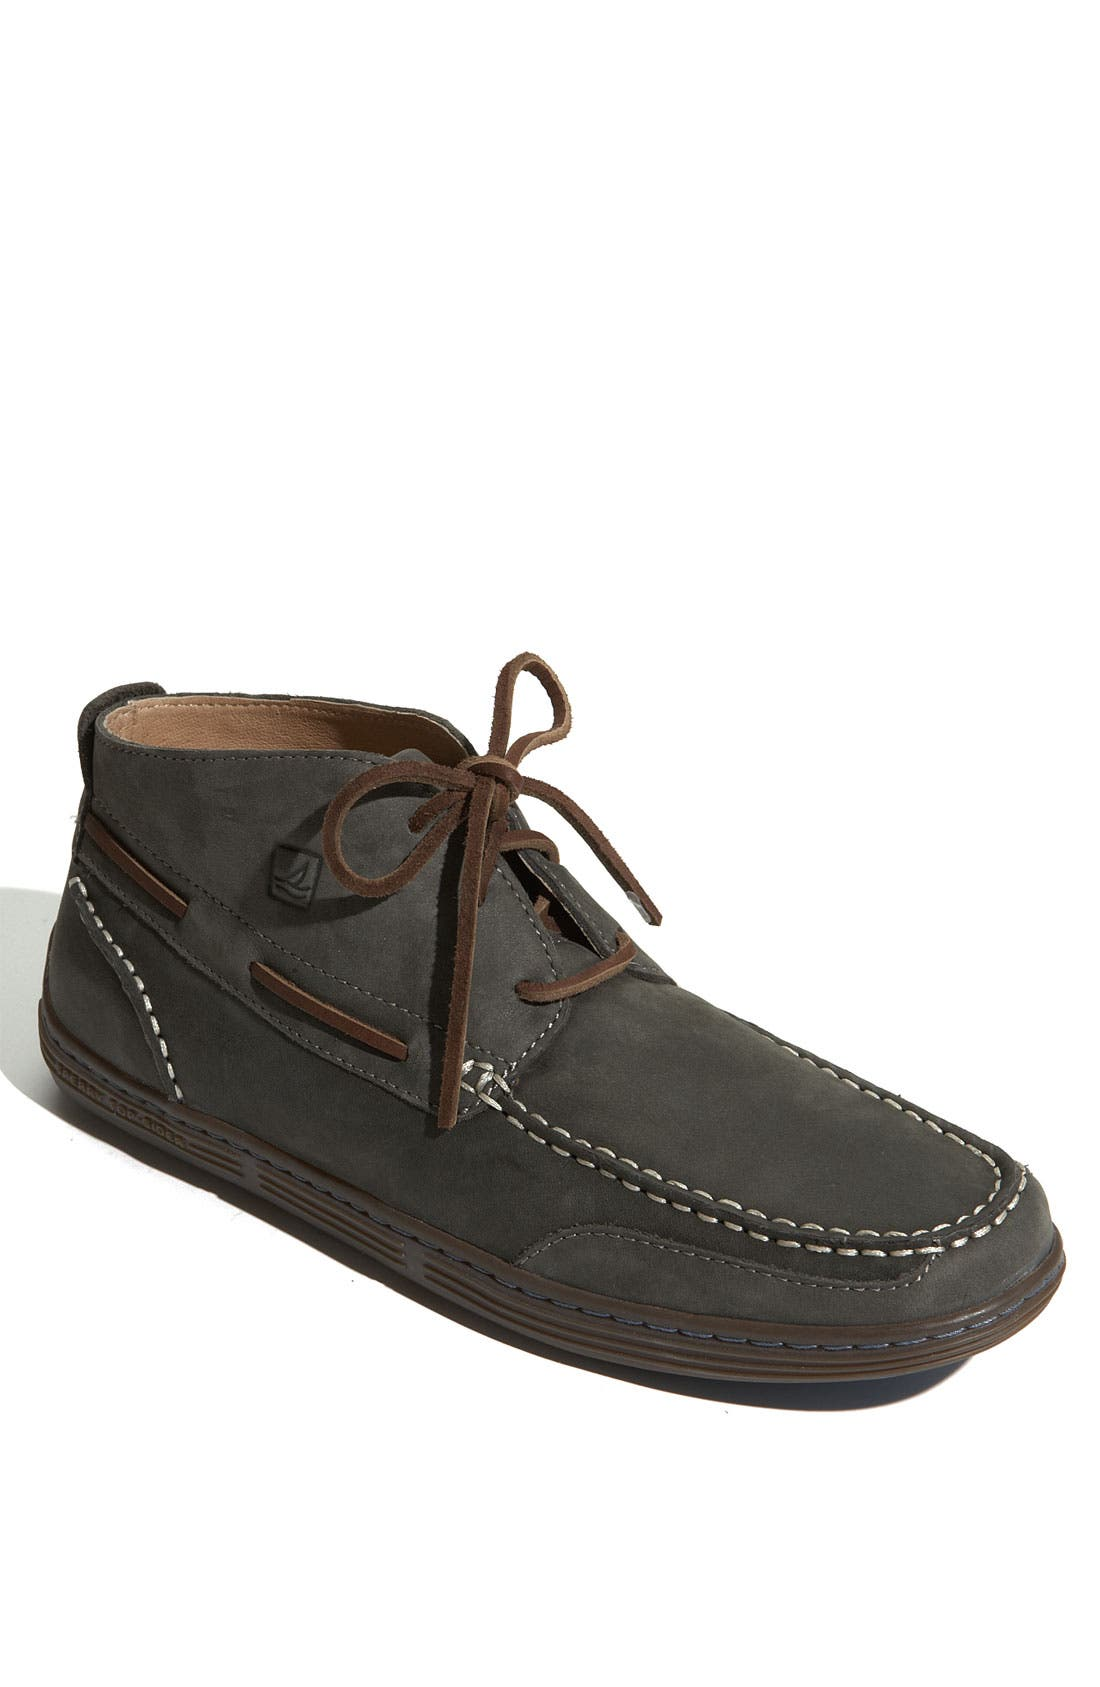 Main Image - Sperry Top-Sider® 'Harbor' Chukka Boot